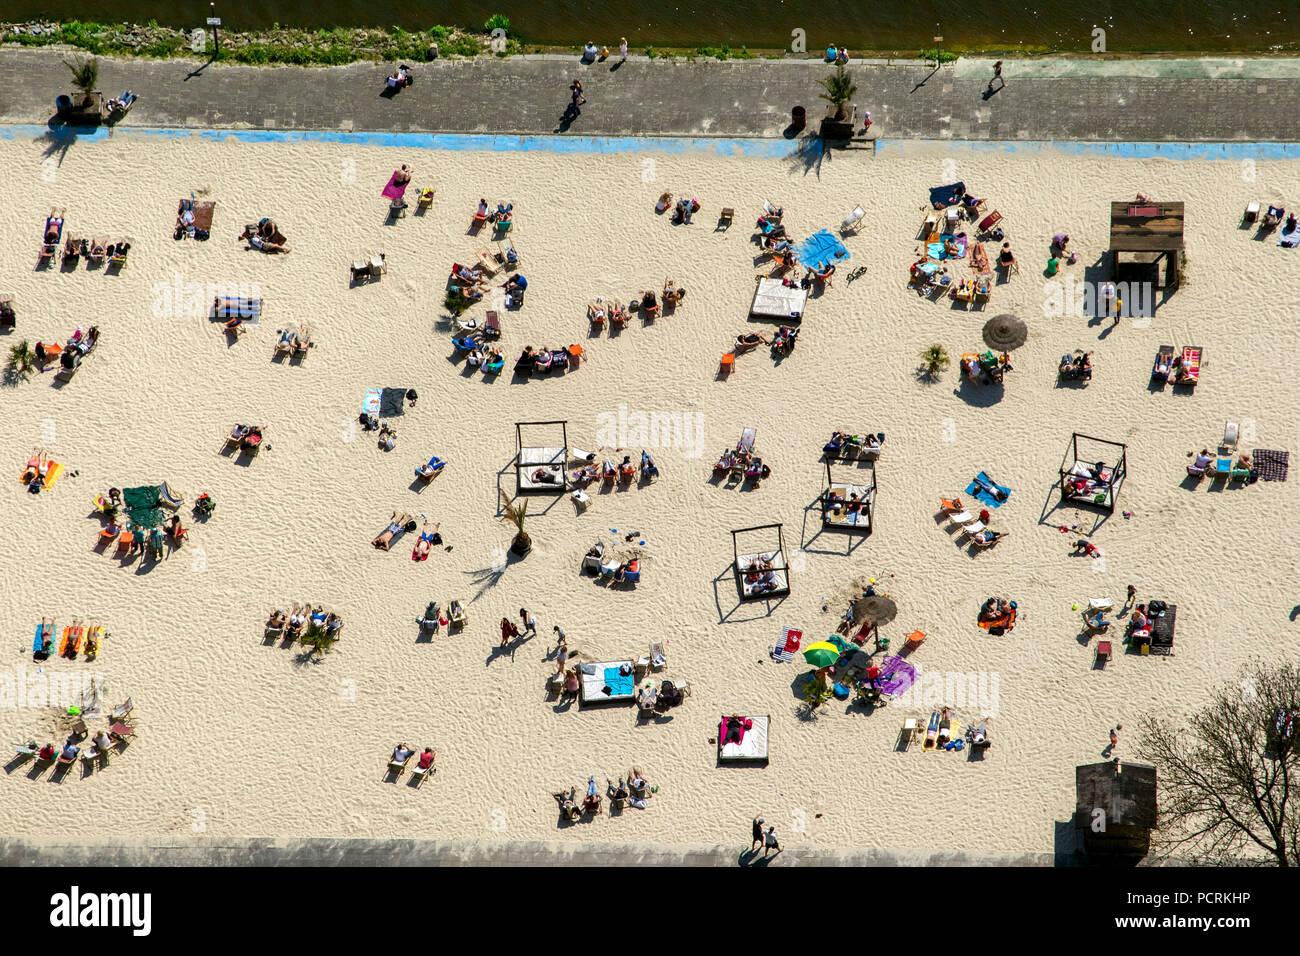 Aerial view of Essen, Lake Baldeneysee with Seaside Beach, Sunbathe, lido - Stock Image